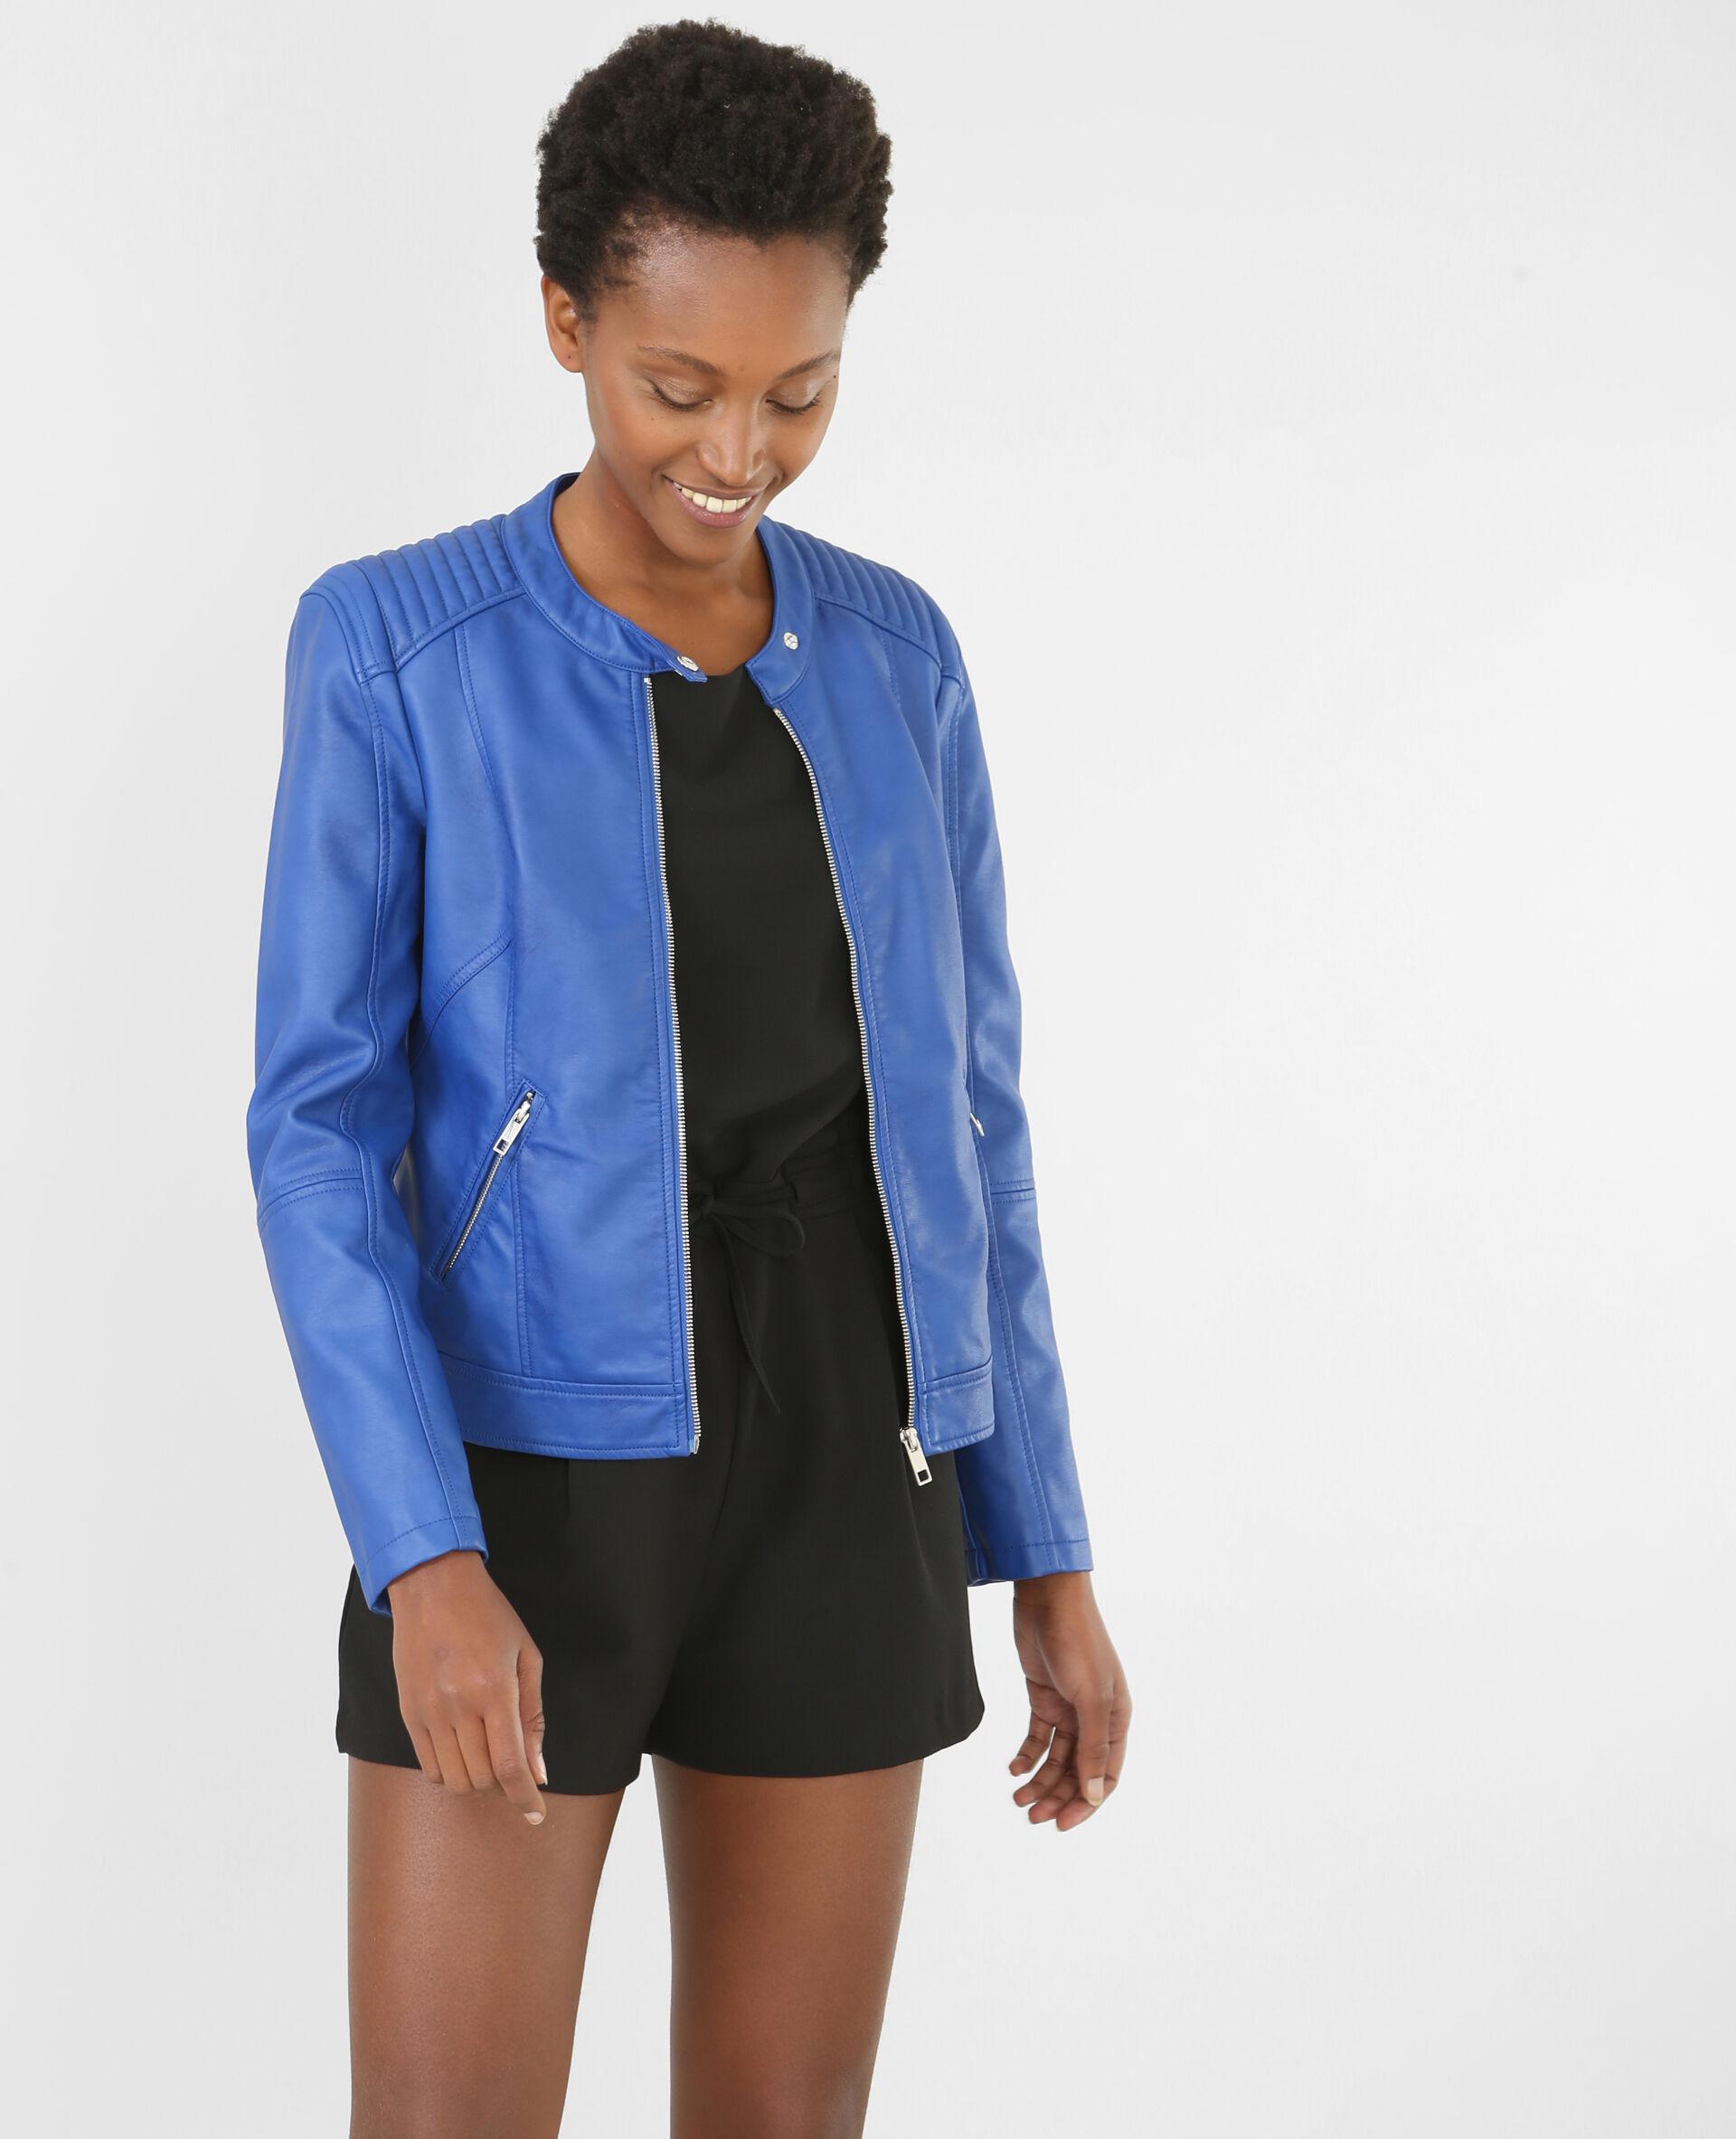 ?veste biker femme couleur bleu taille 40 pimkie mode femme